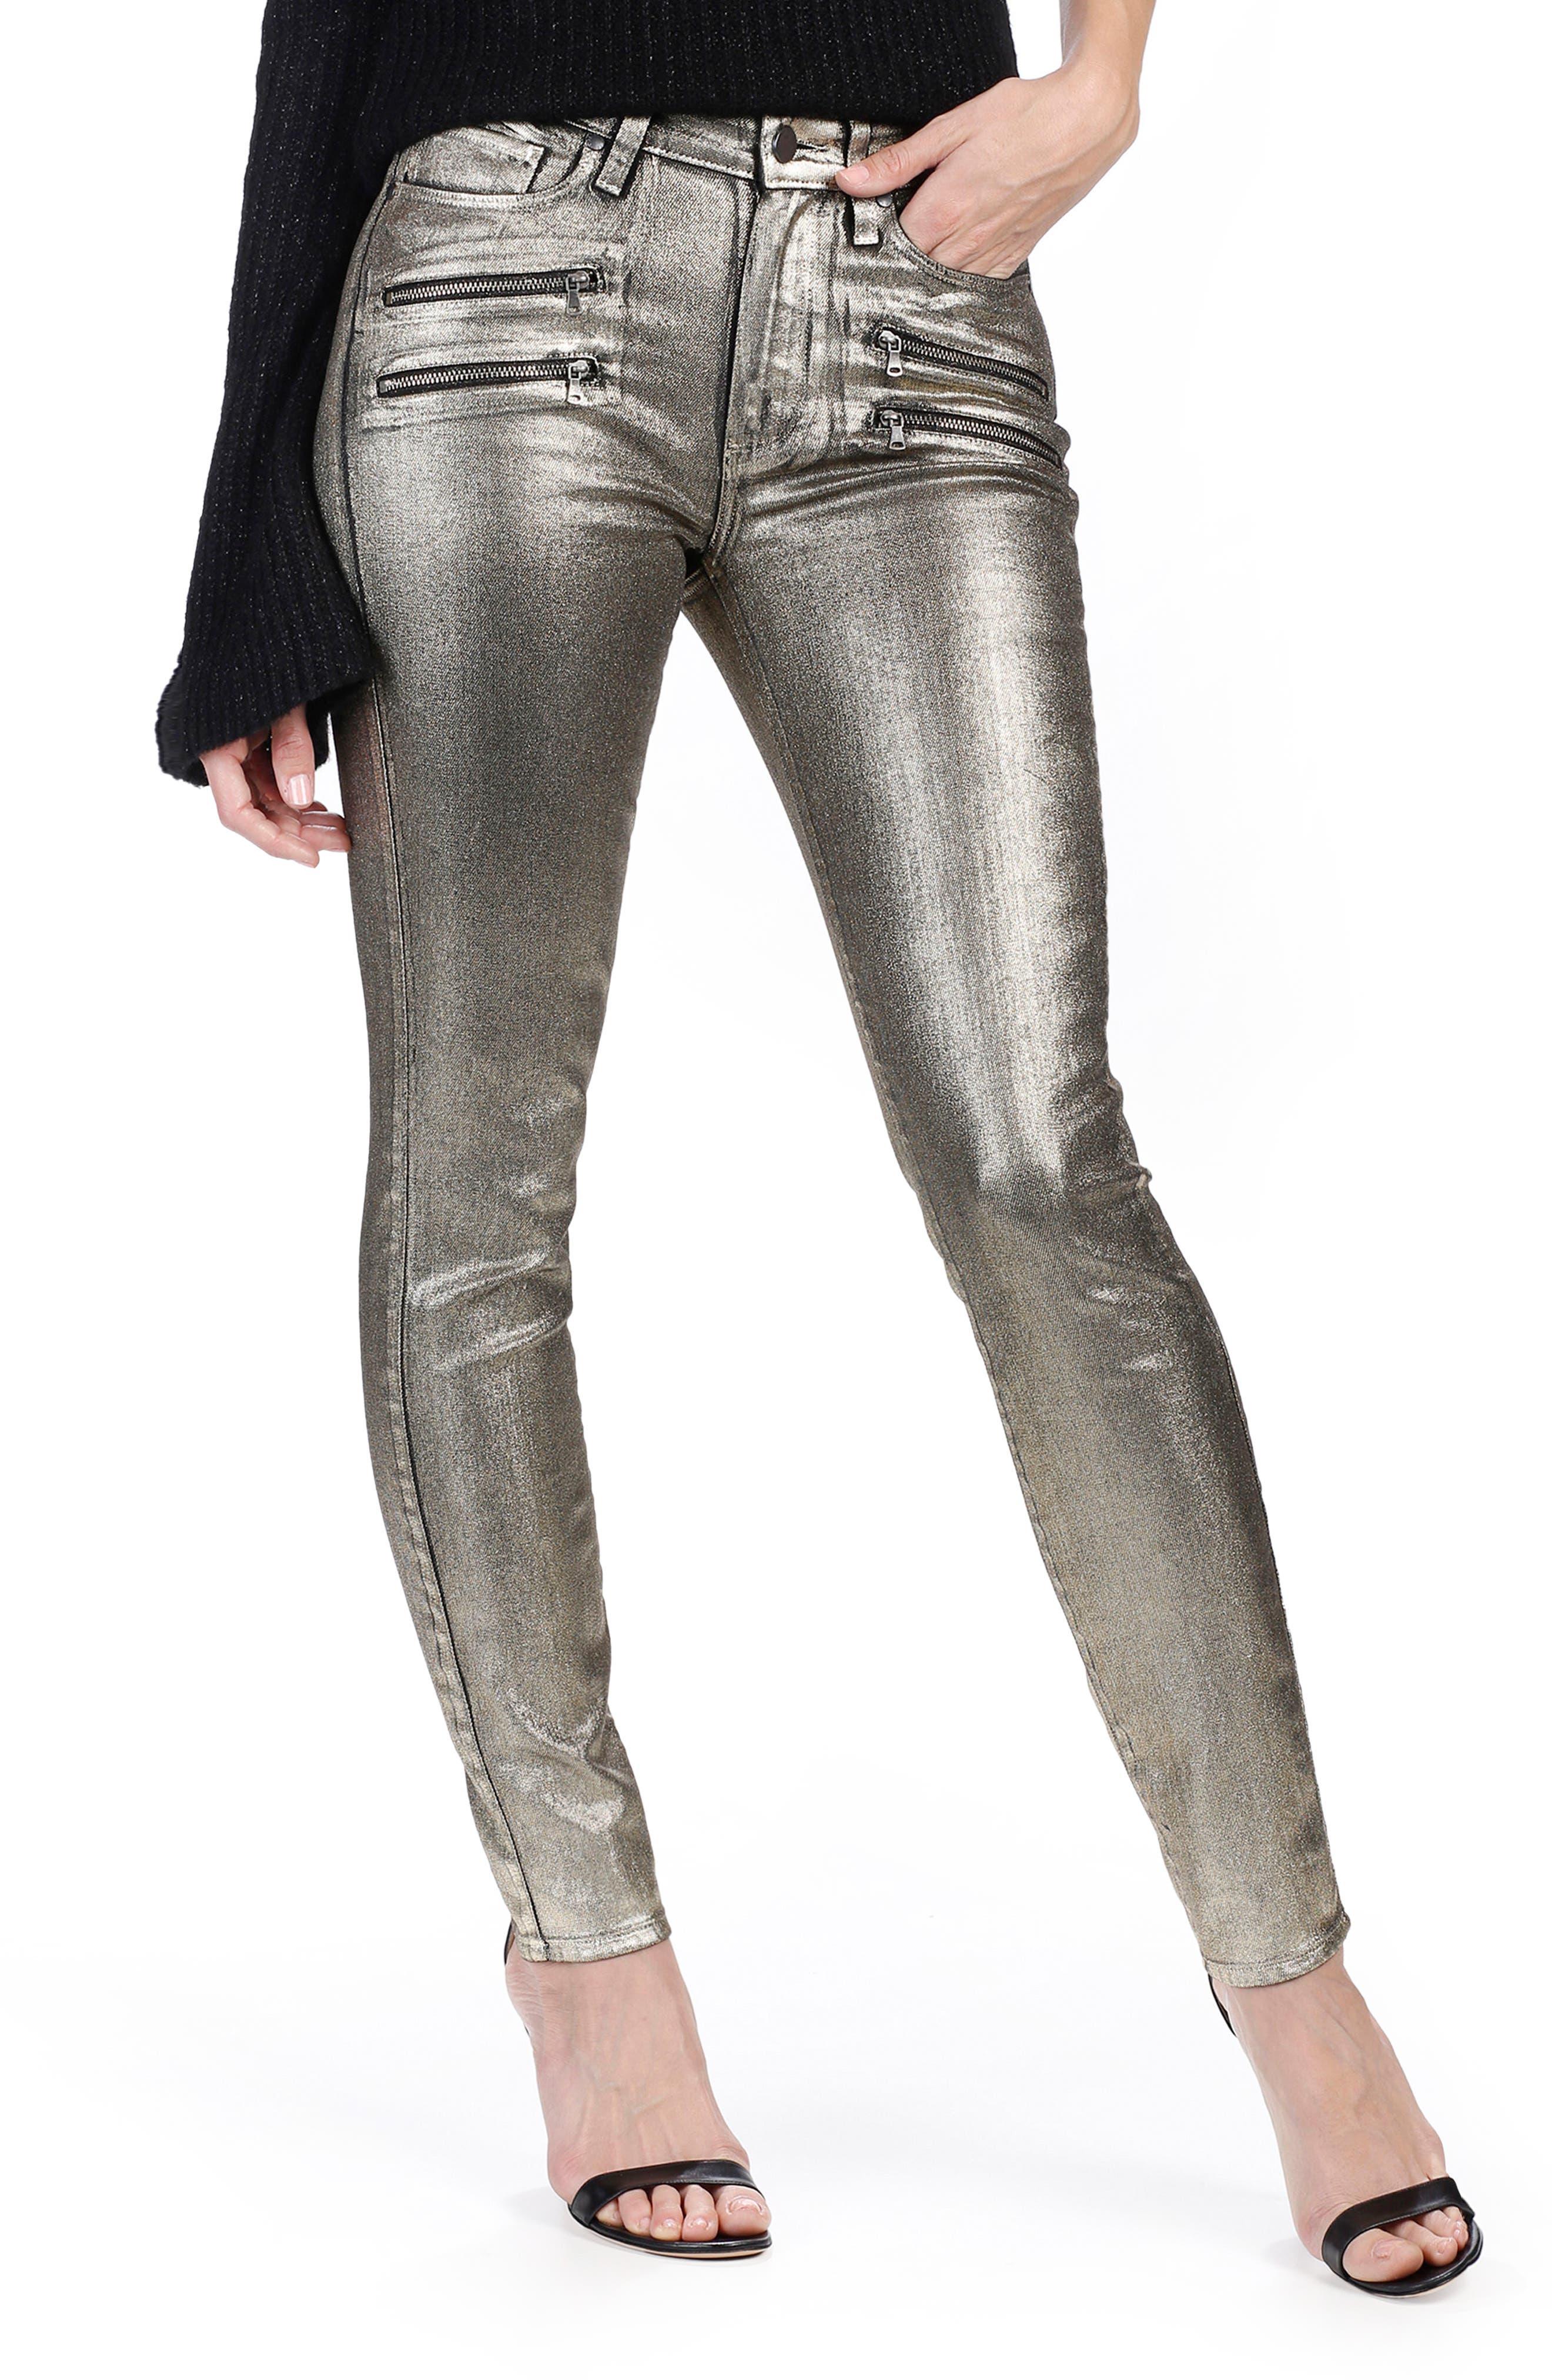 Rosie HW x PAIGE Stevie High Waist Skinny Jeans,                         Main,                         color, 710